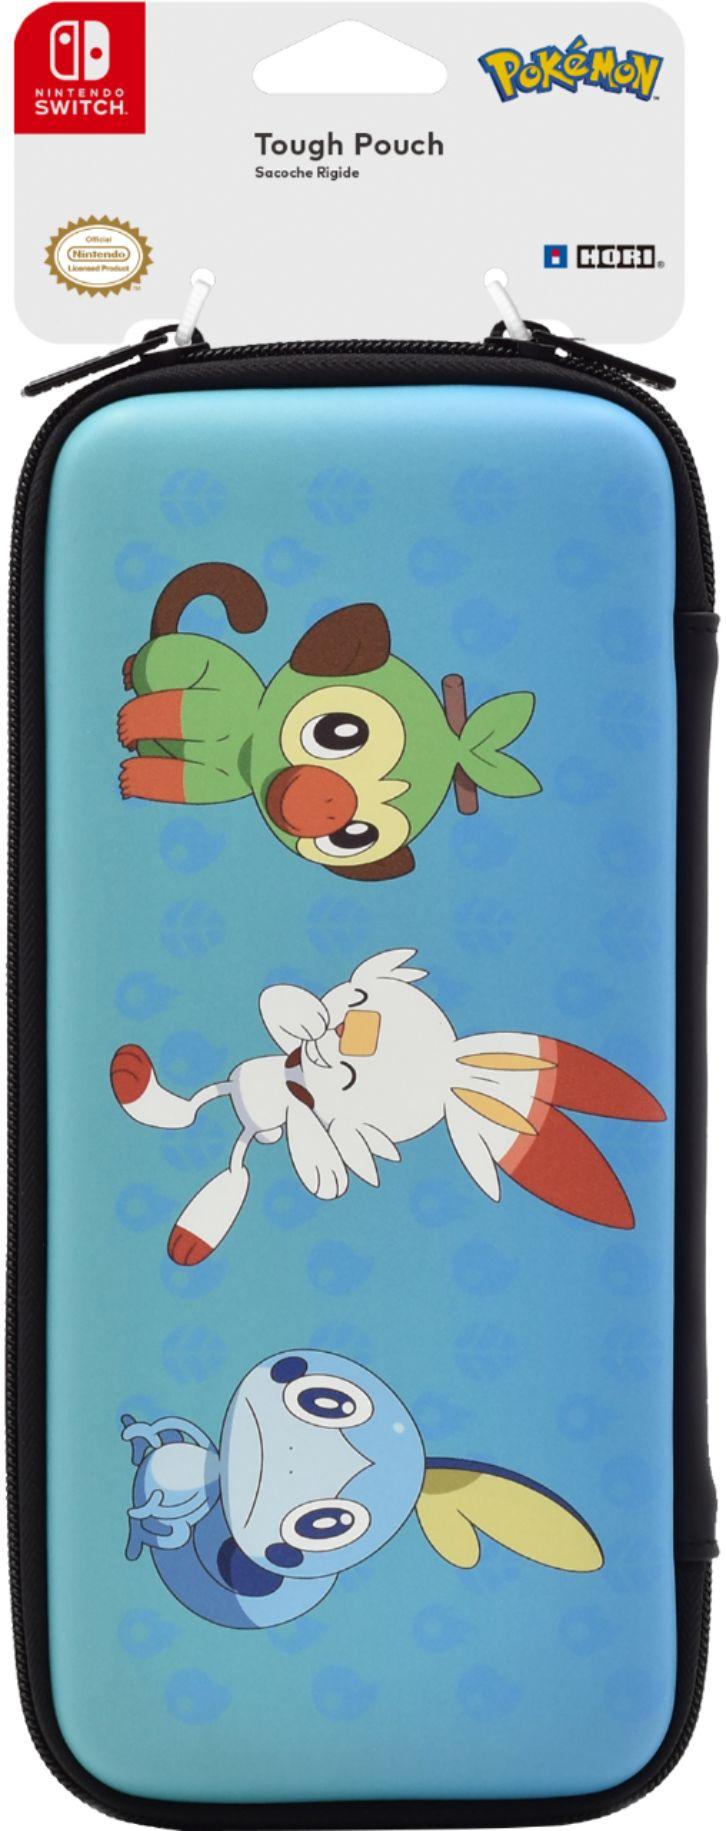 Nintendo Switch Pokemon Sword & Shield Hard Pouch